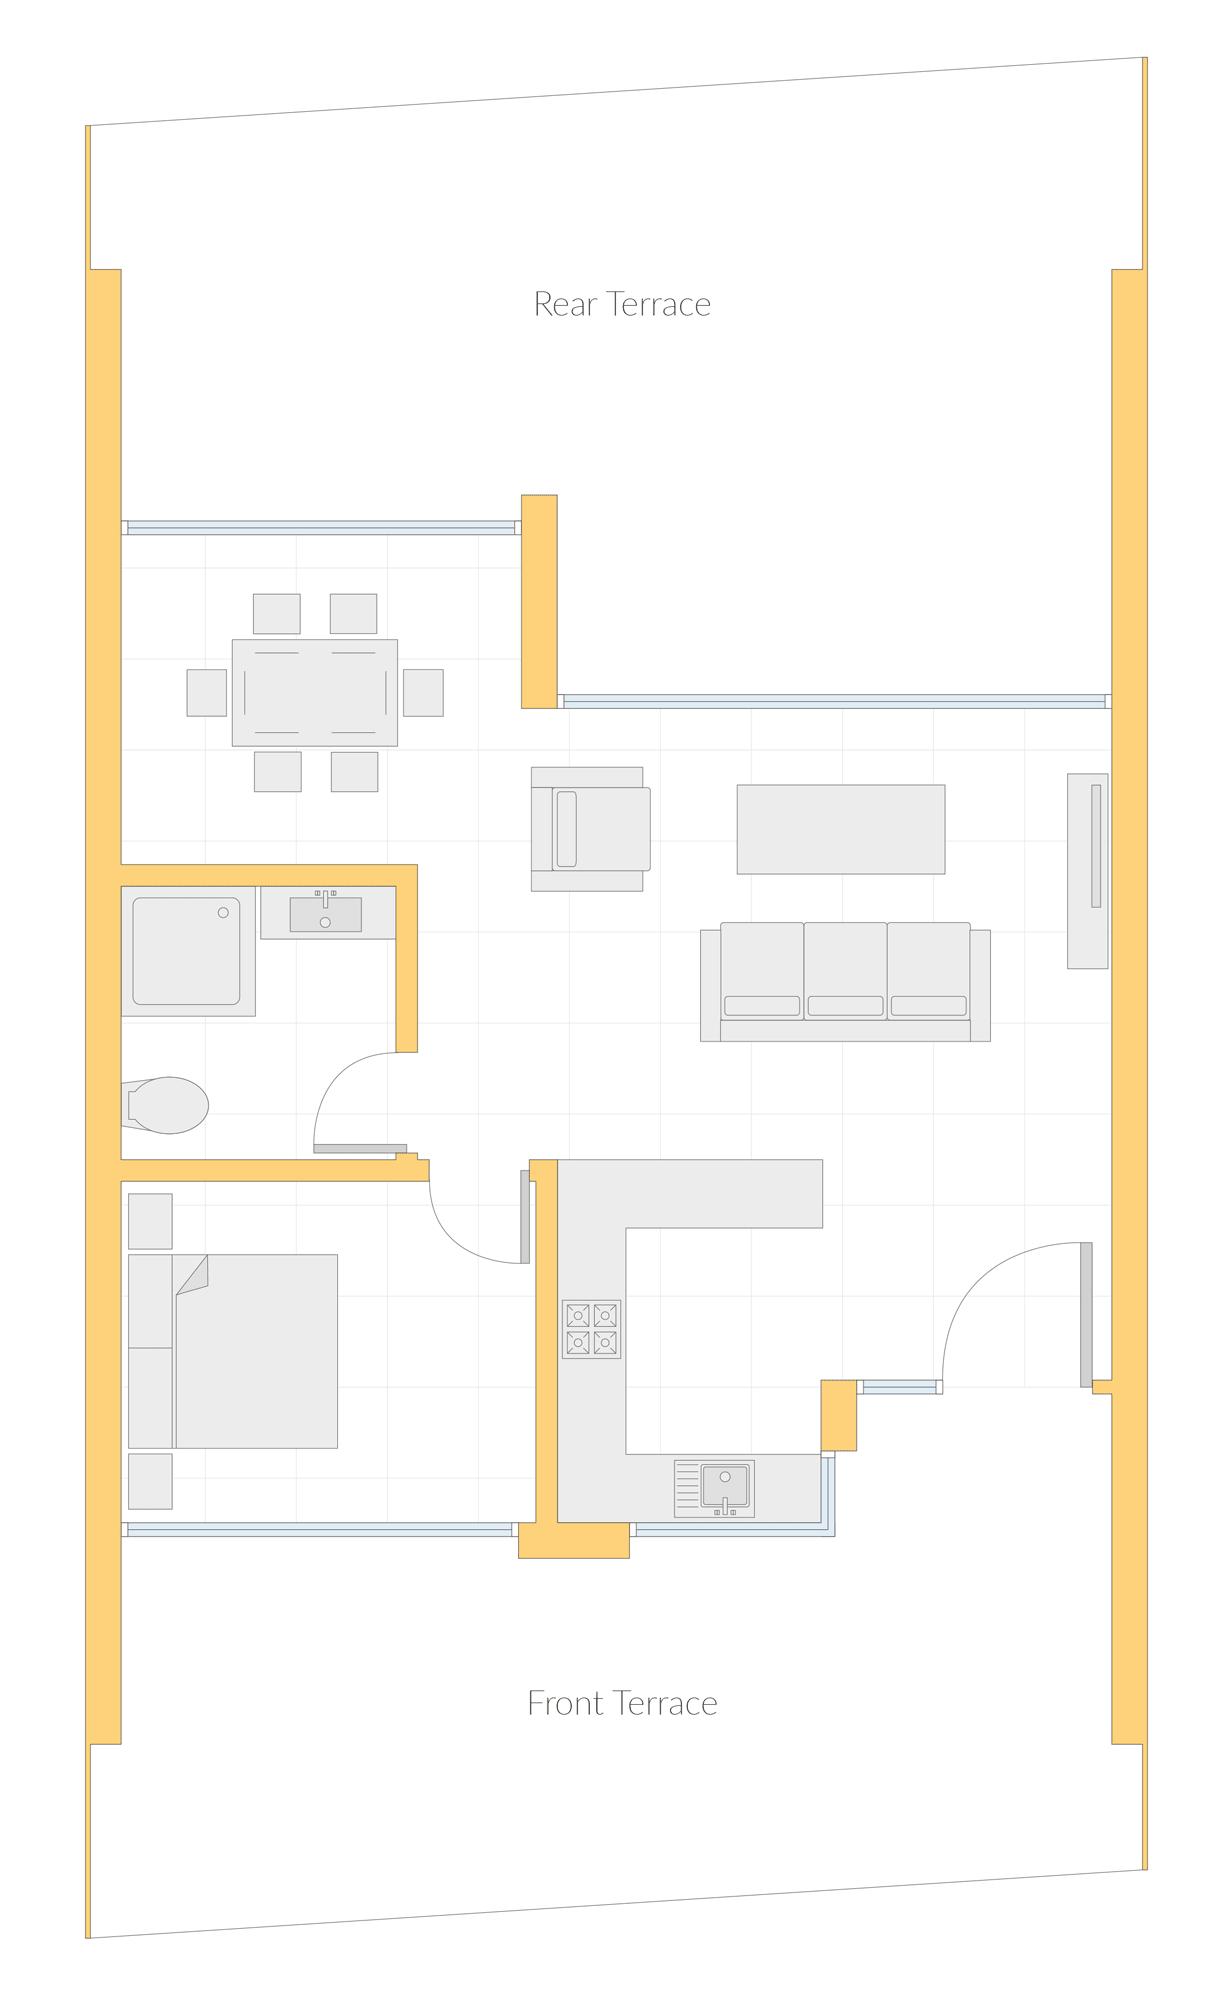 Floorplan of one bedroom property in the Algarve at Quinta Heights